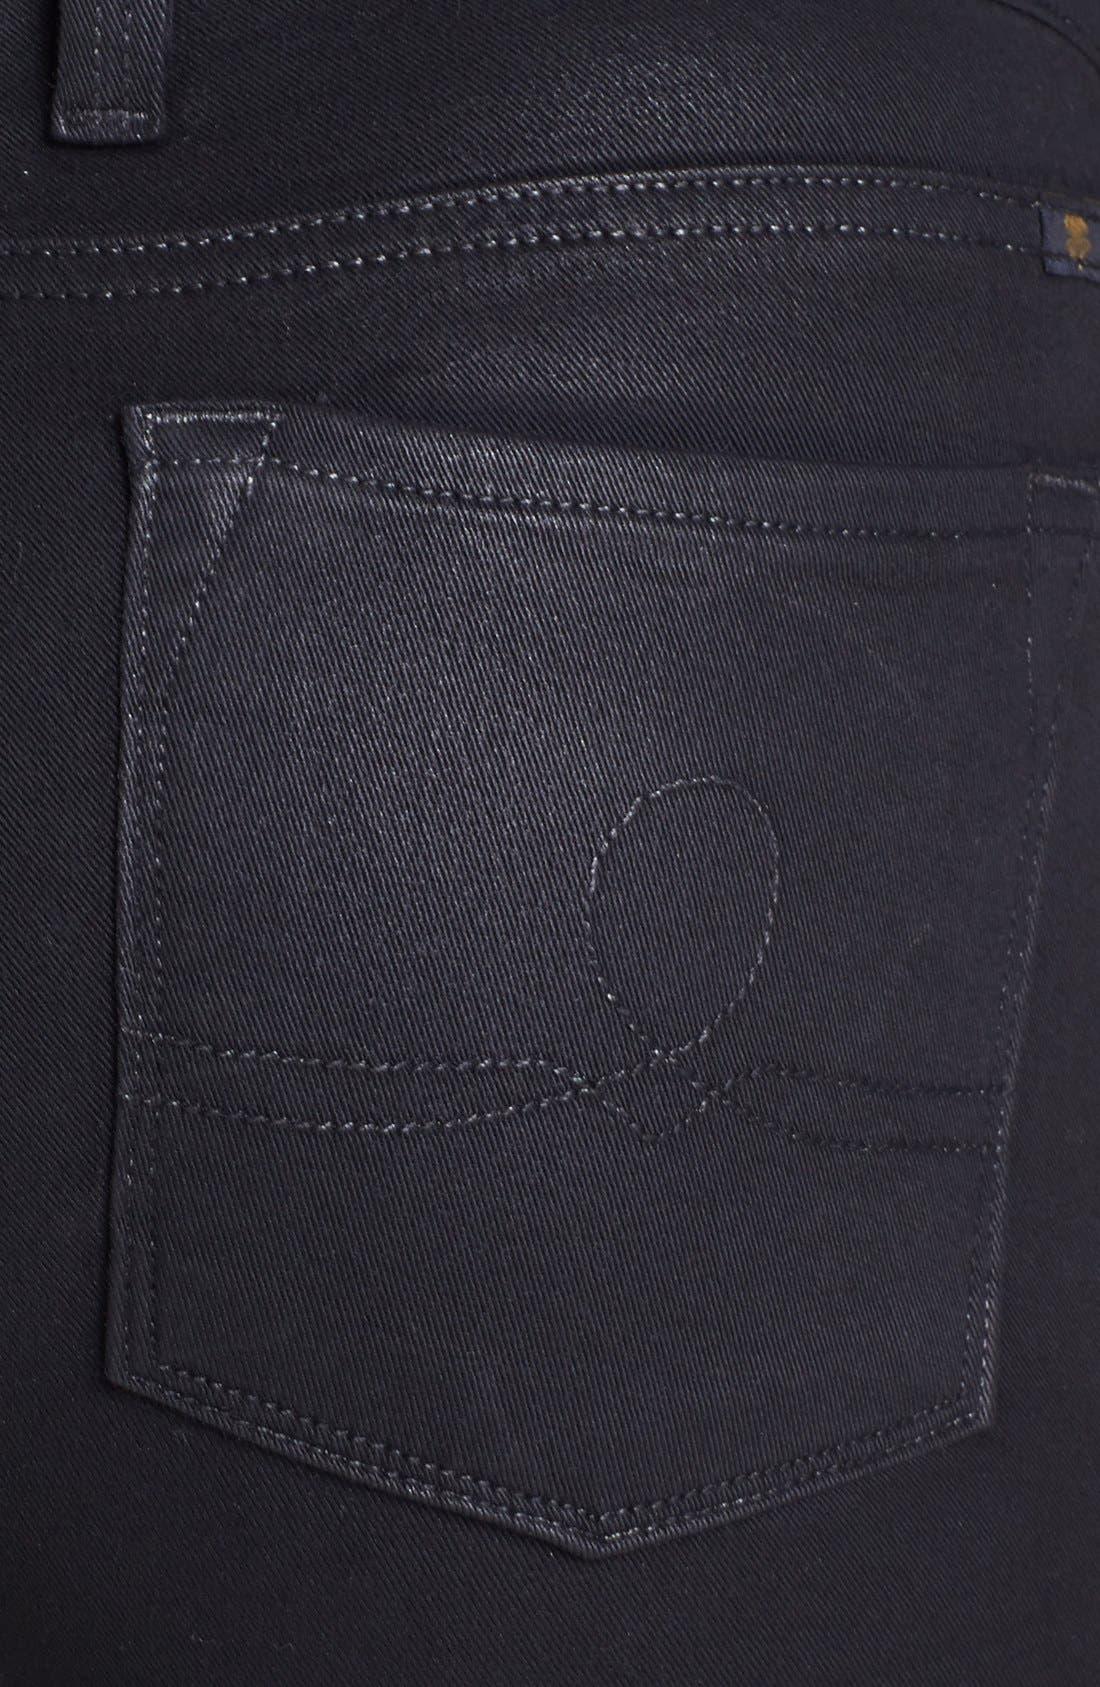 Alternate Image 5  - Lucky Brand 'Sofia' Coated Skinny Jeans (Black)